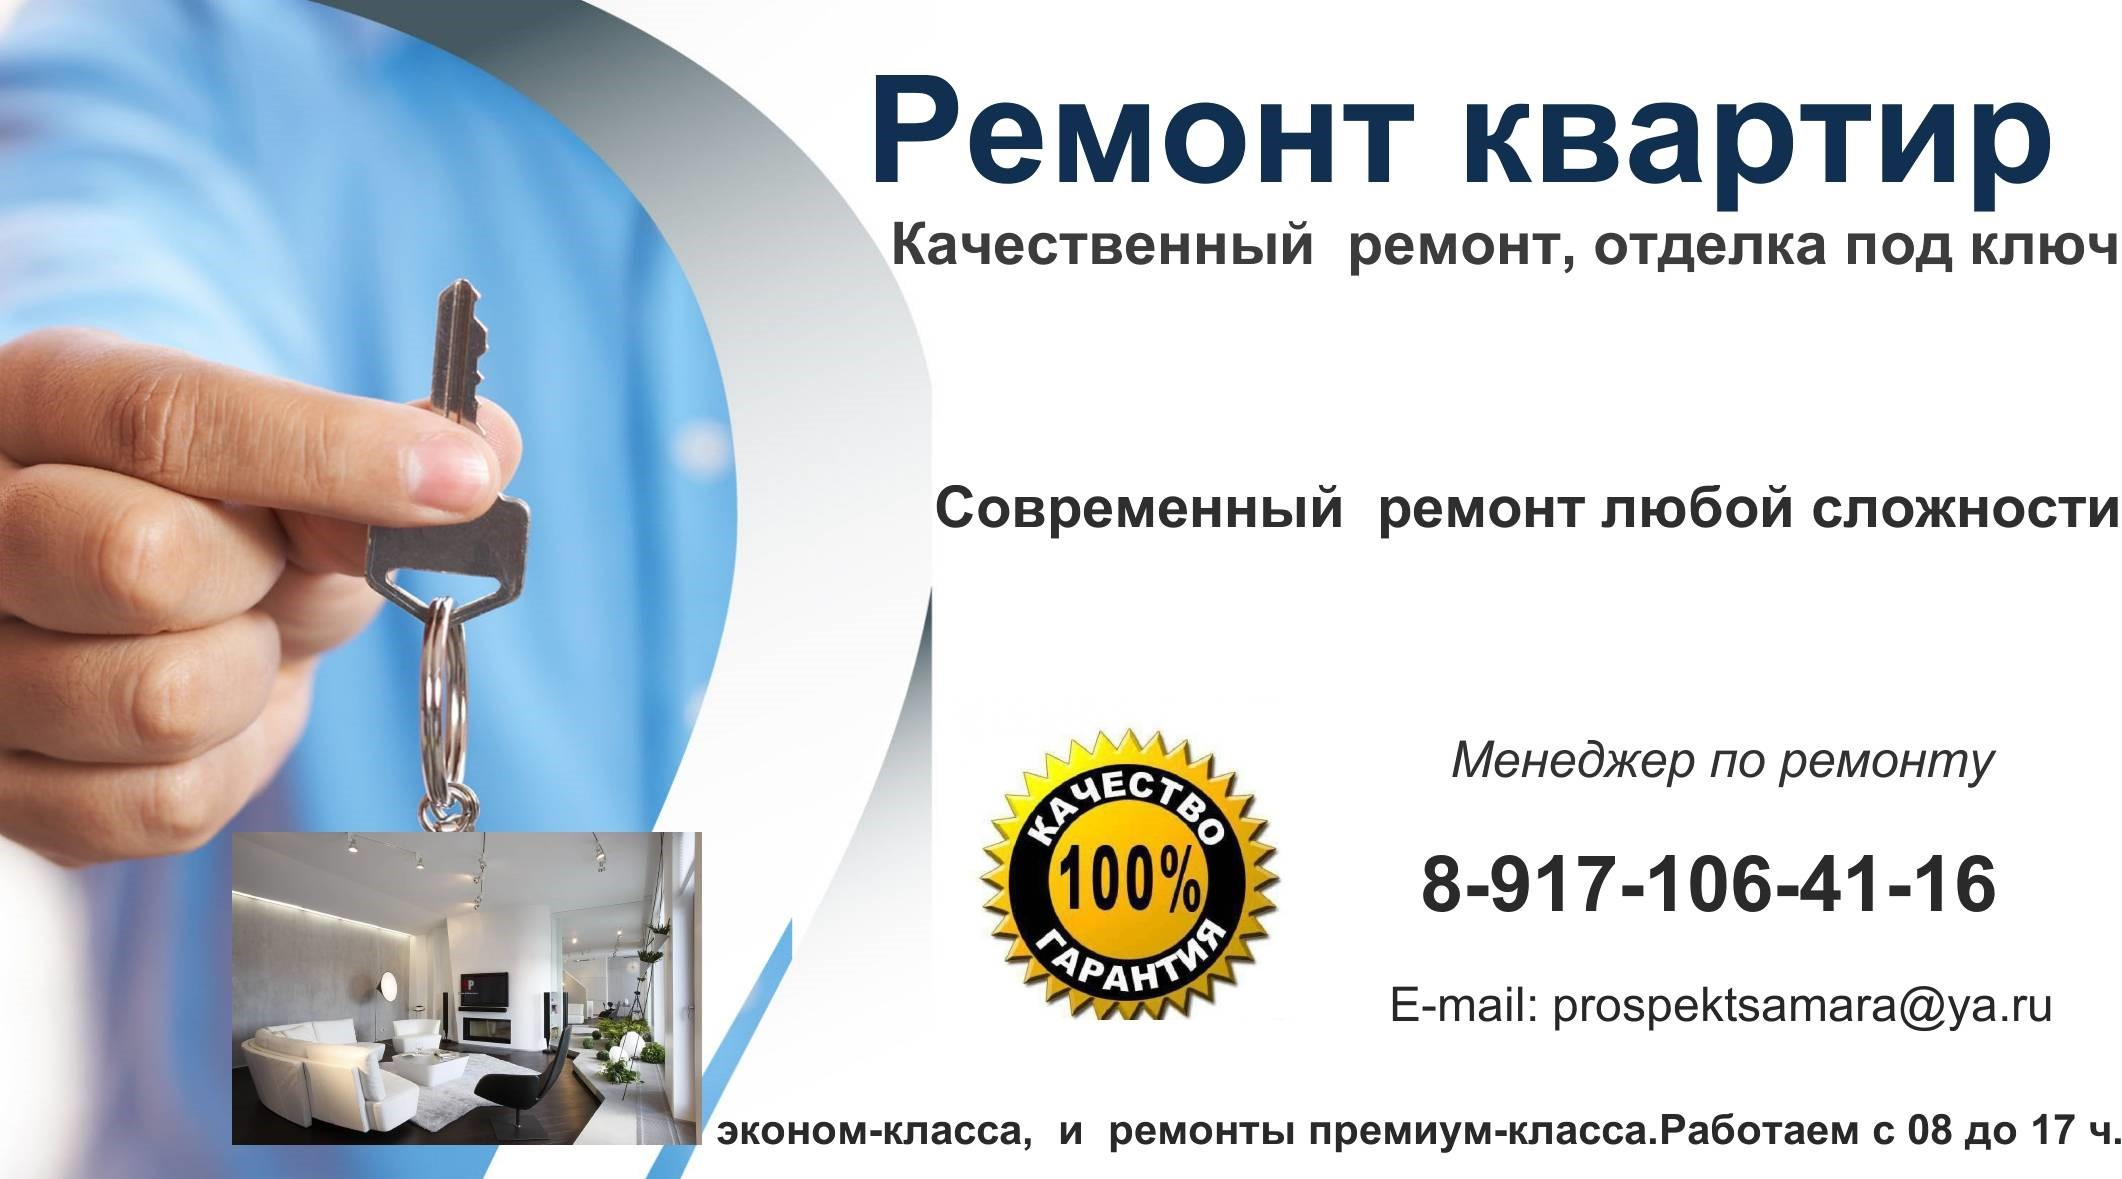 Визитки для ремонта квартир в Москве | фото 6